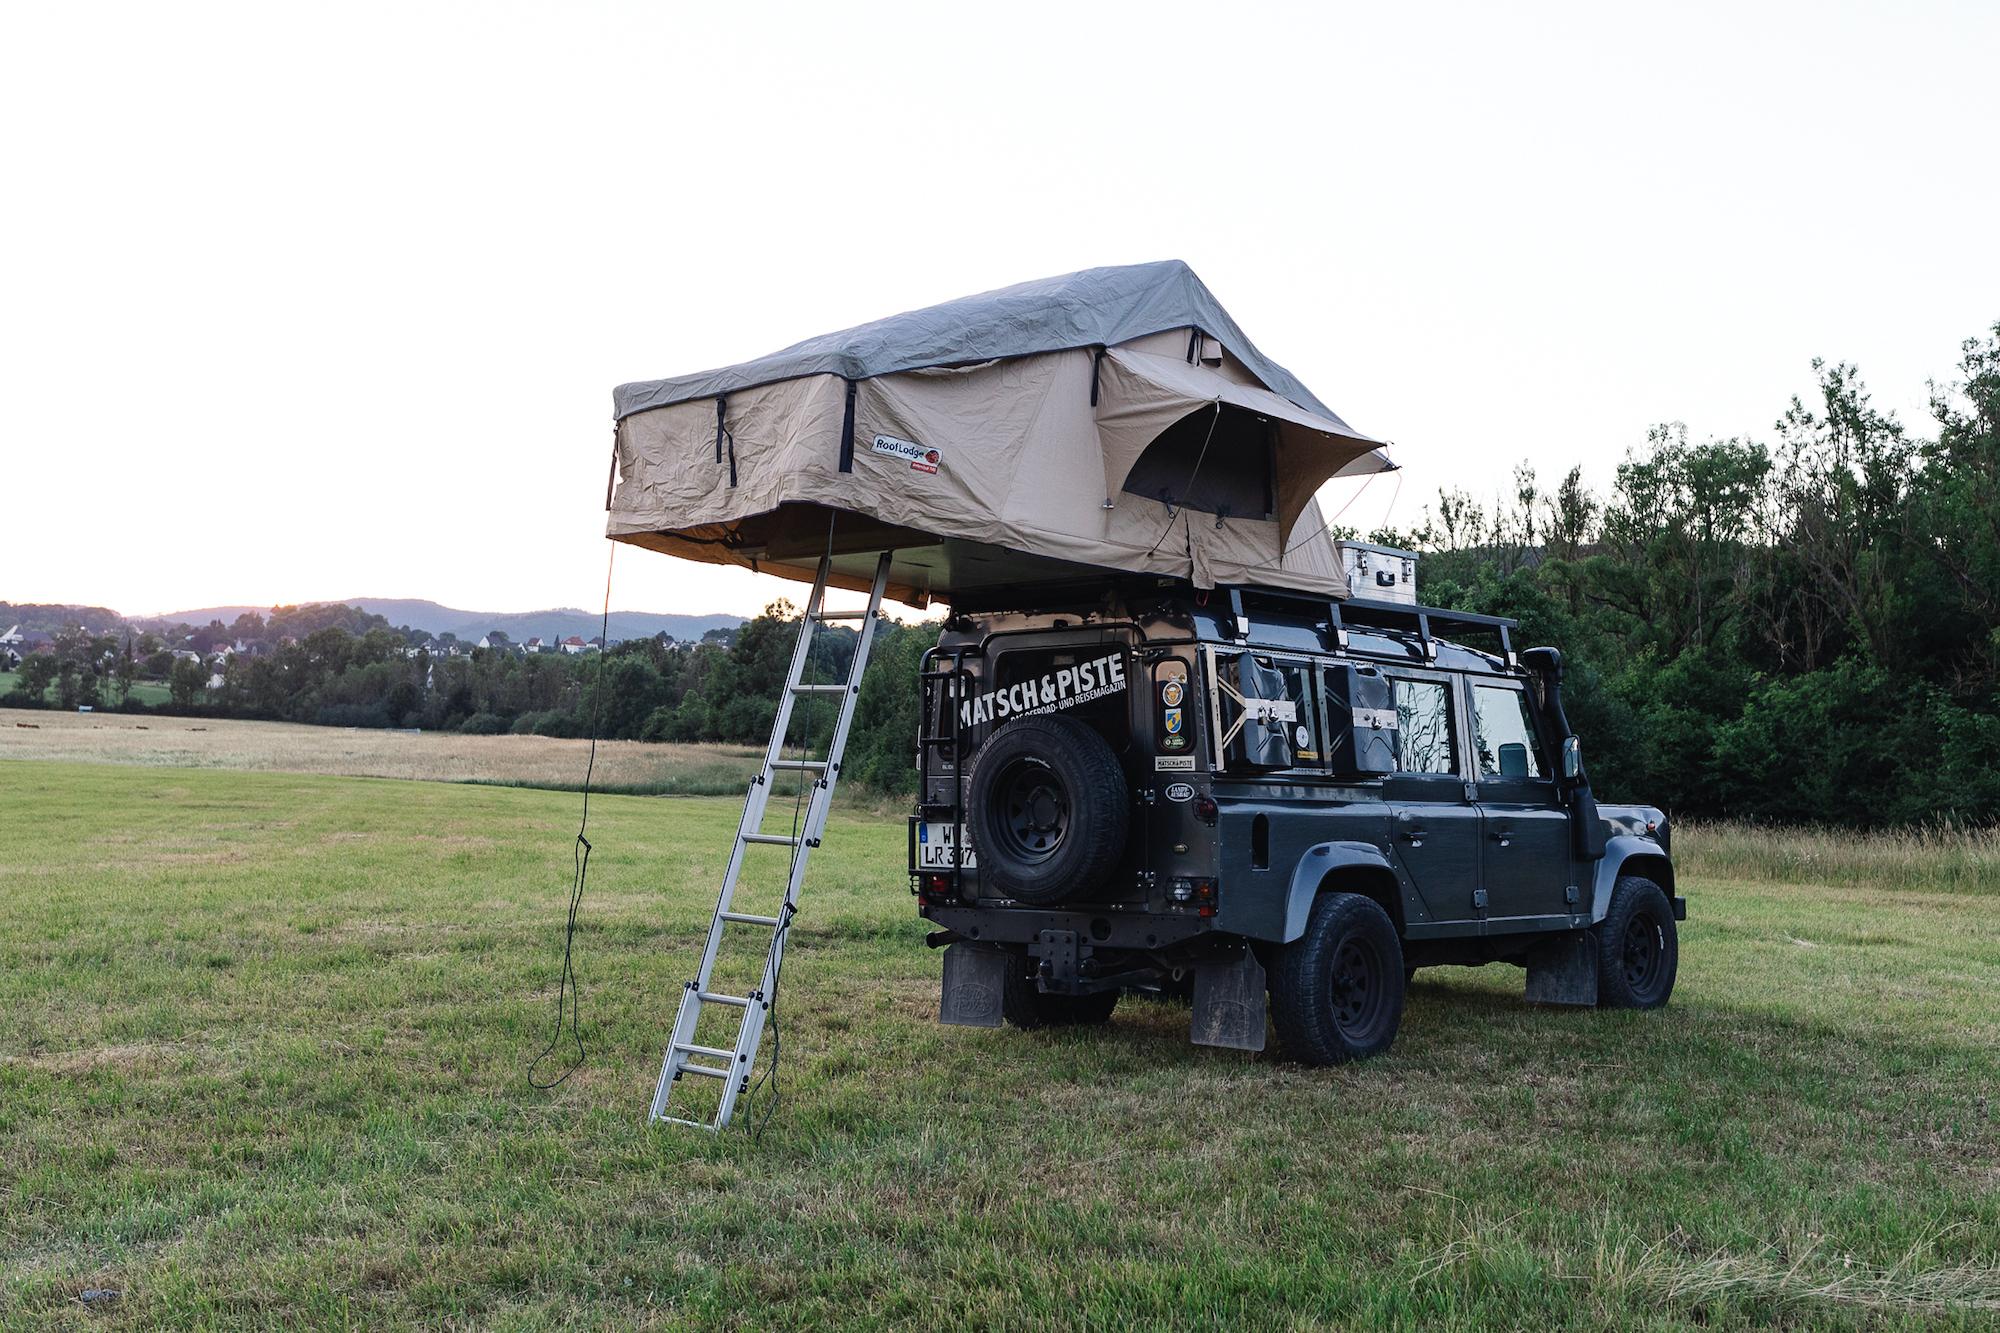 Dachzelt-Test - Das alte Dachzelt von Nakatanenga